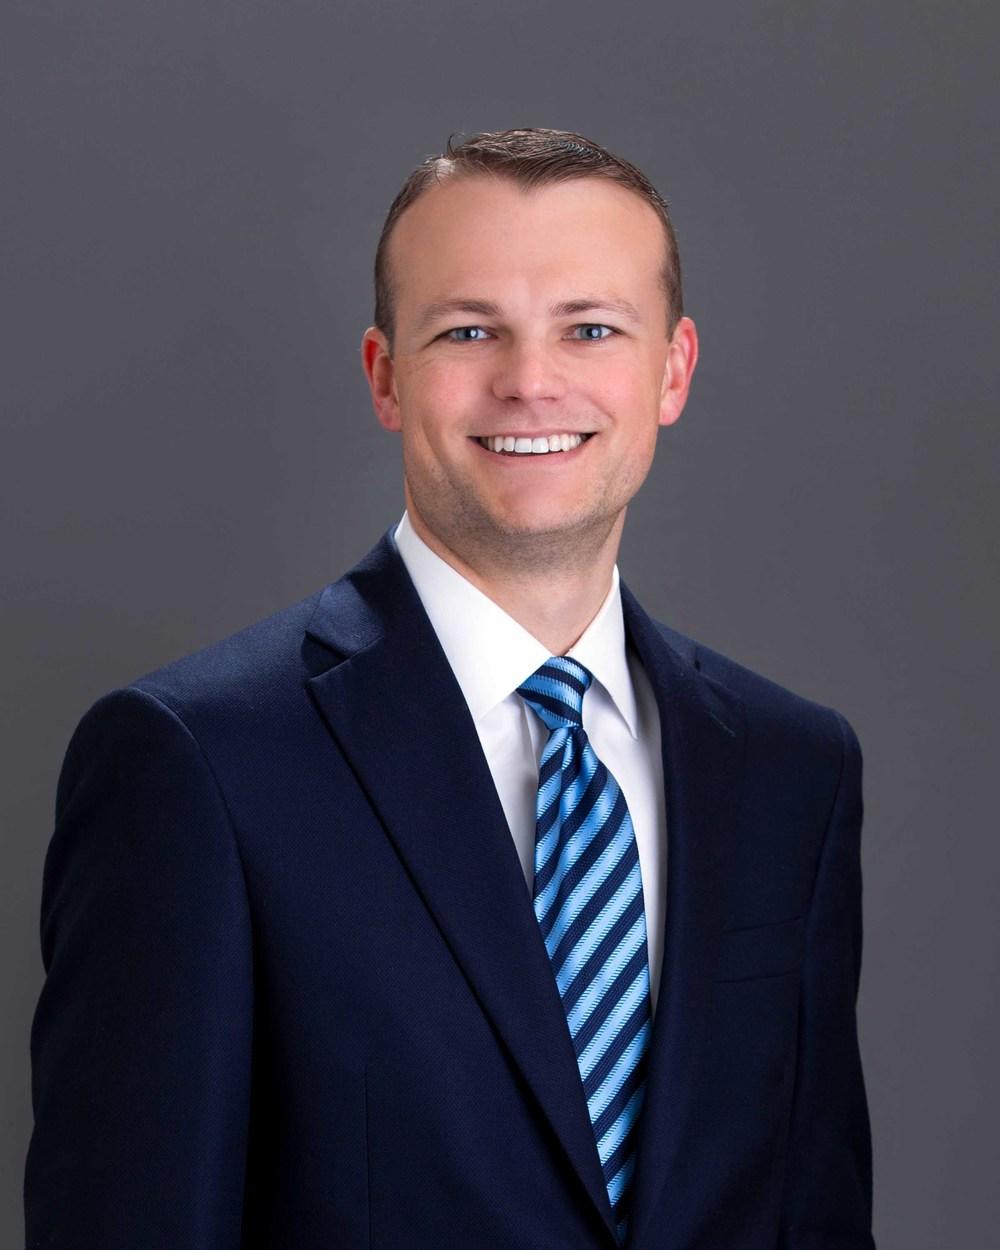 Jonathan P. Ludeman, CFP, AIF, Financial Advisor